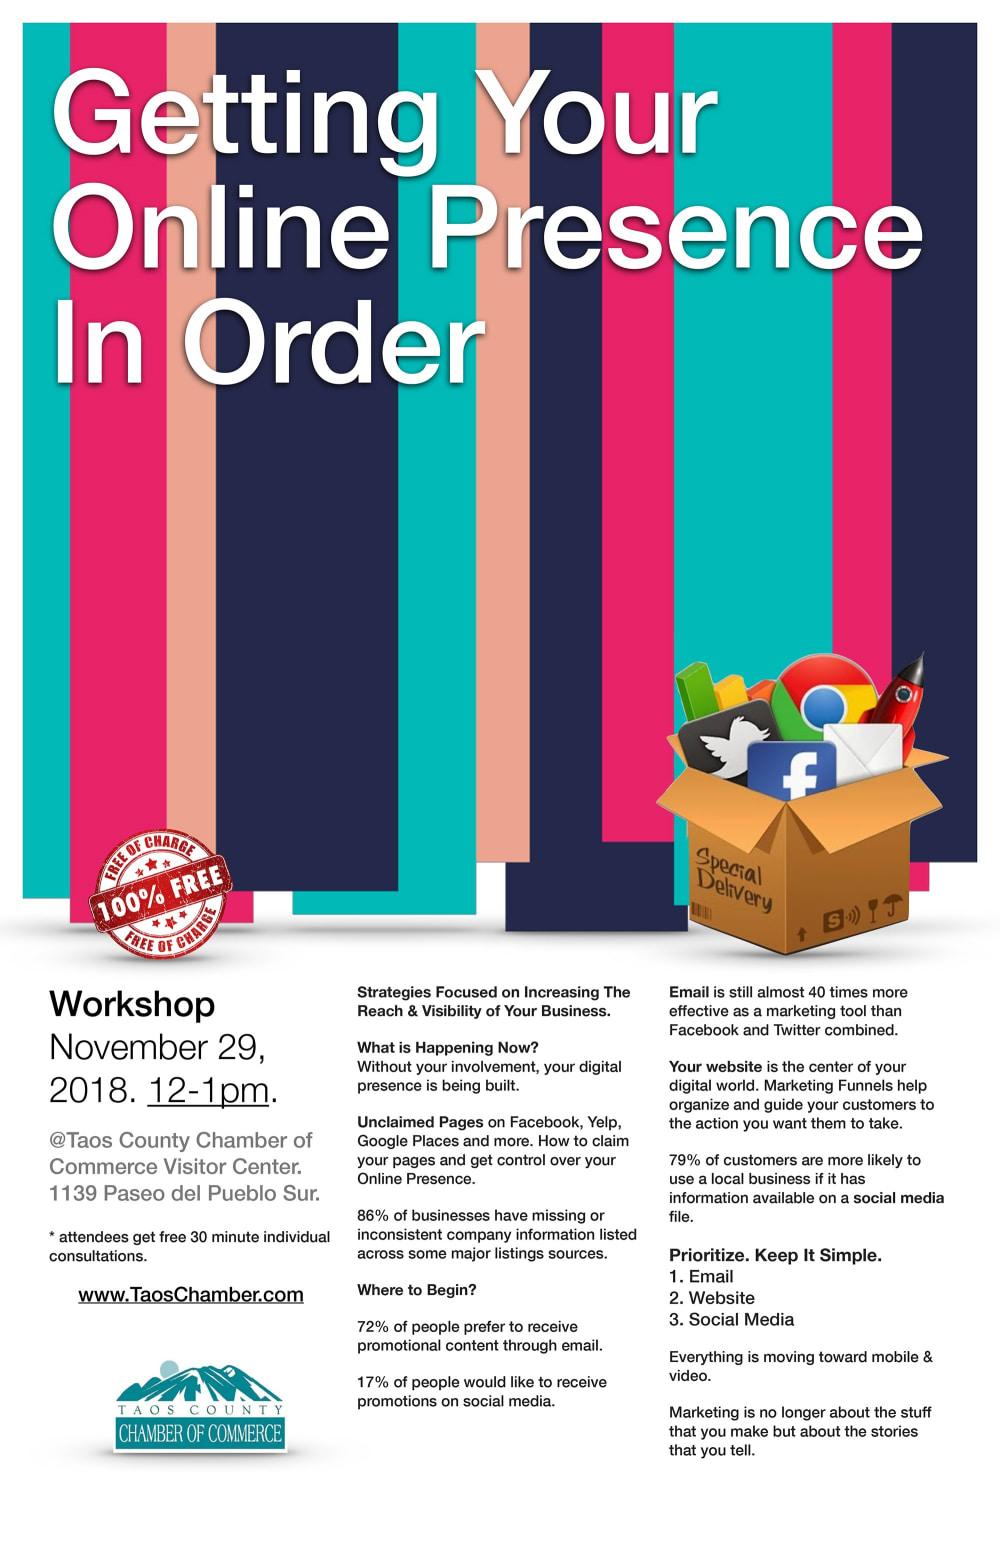 Online-Presence-Seminar-Flyer-w1000.jpg